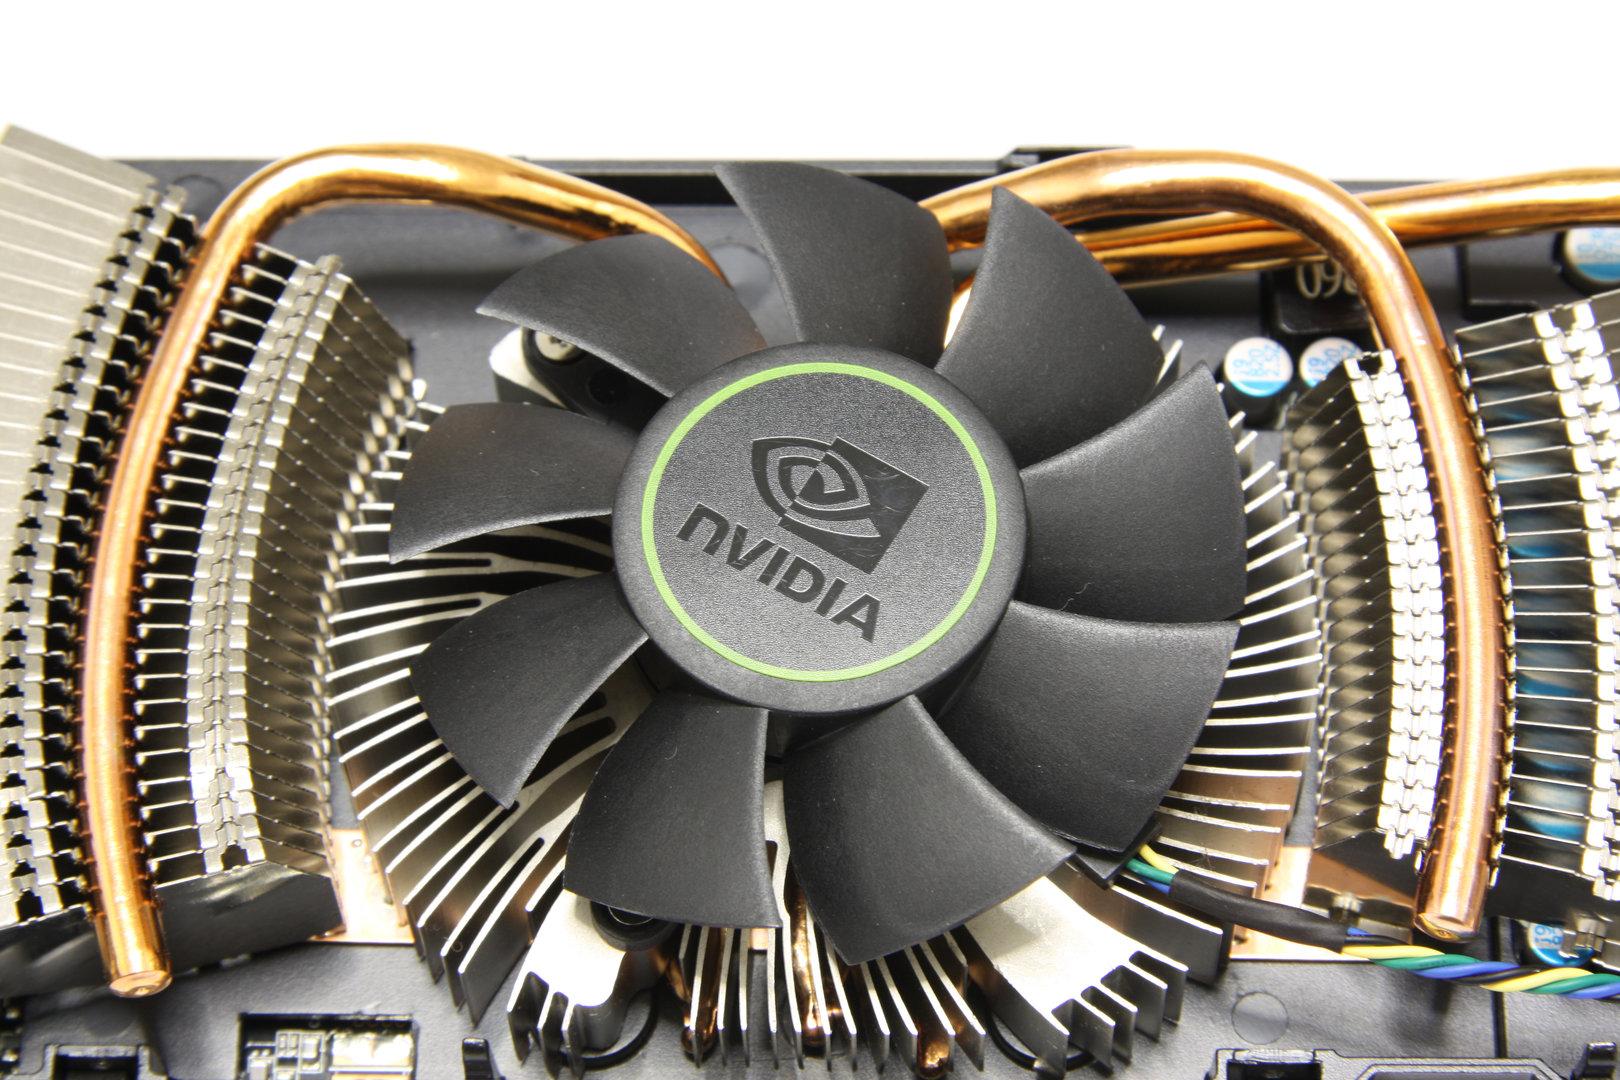 GeForce GTX 560 Ti Lüfter